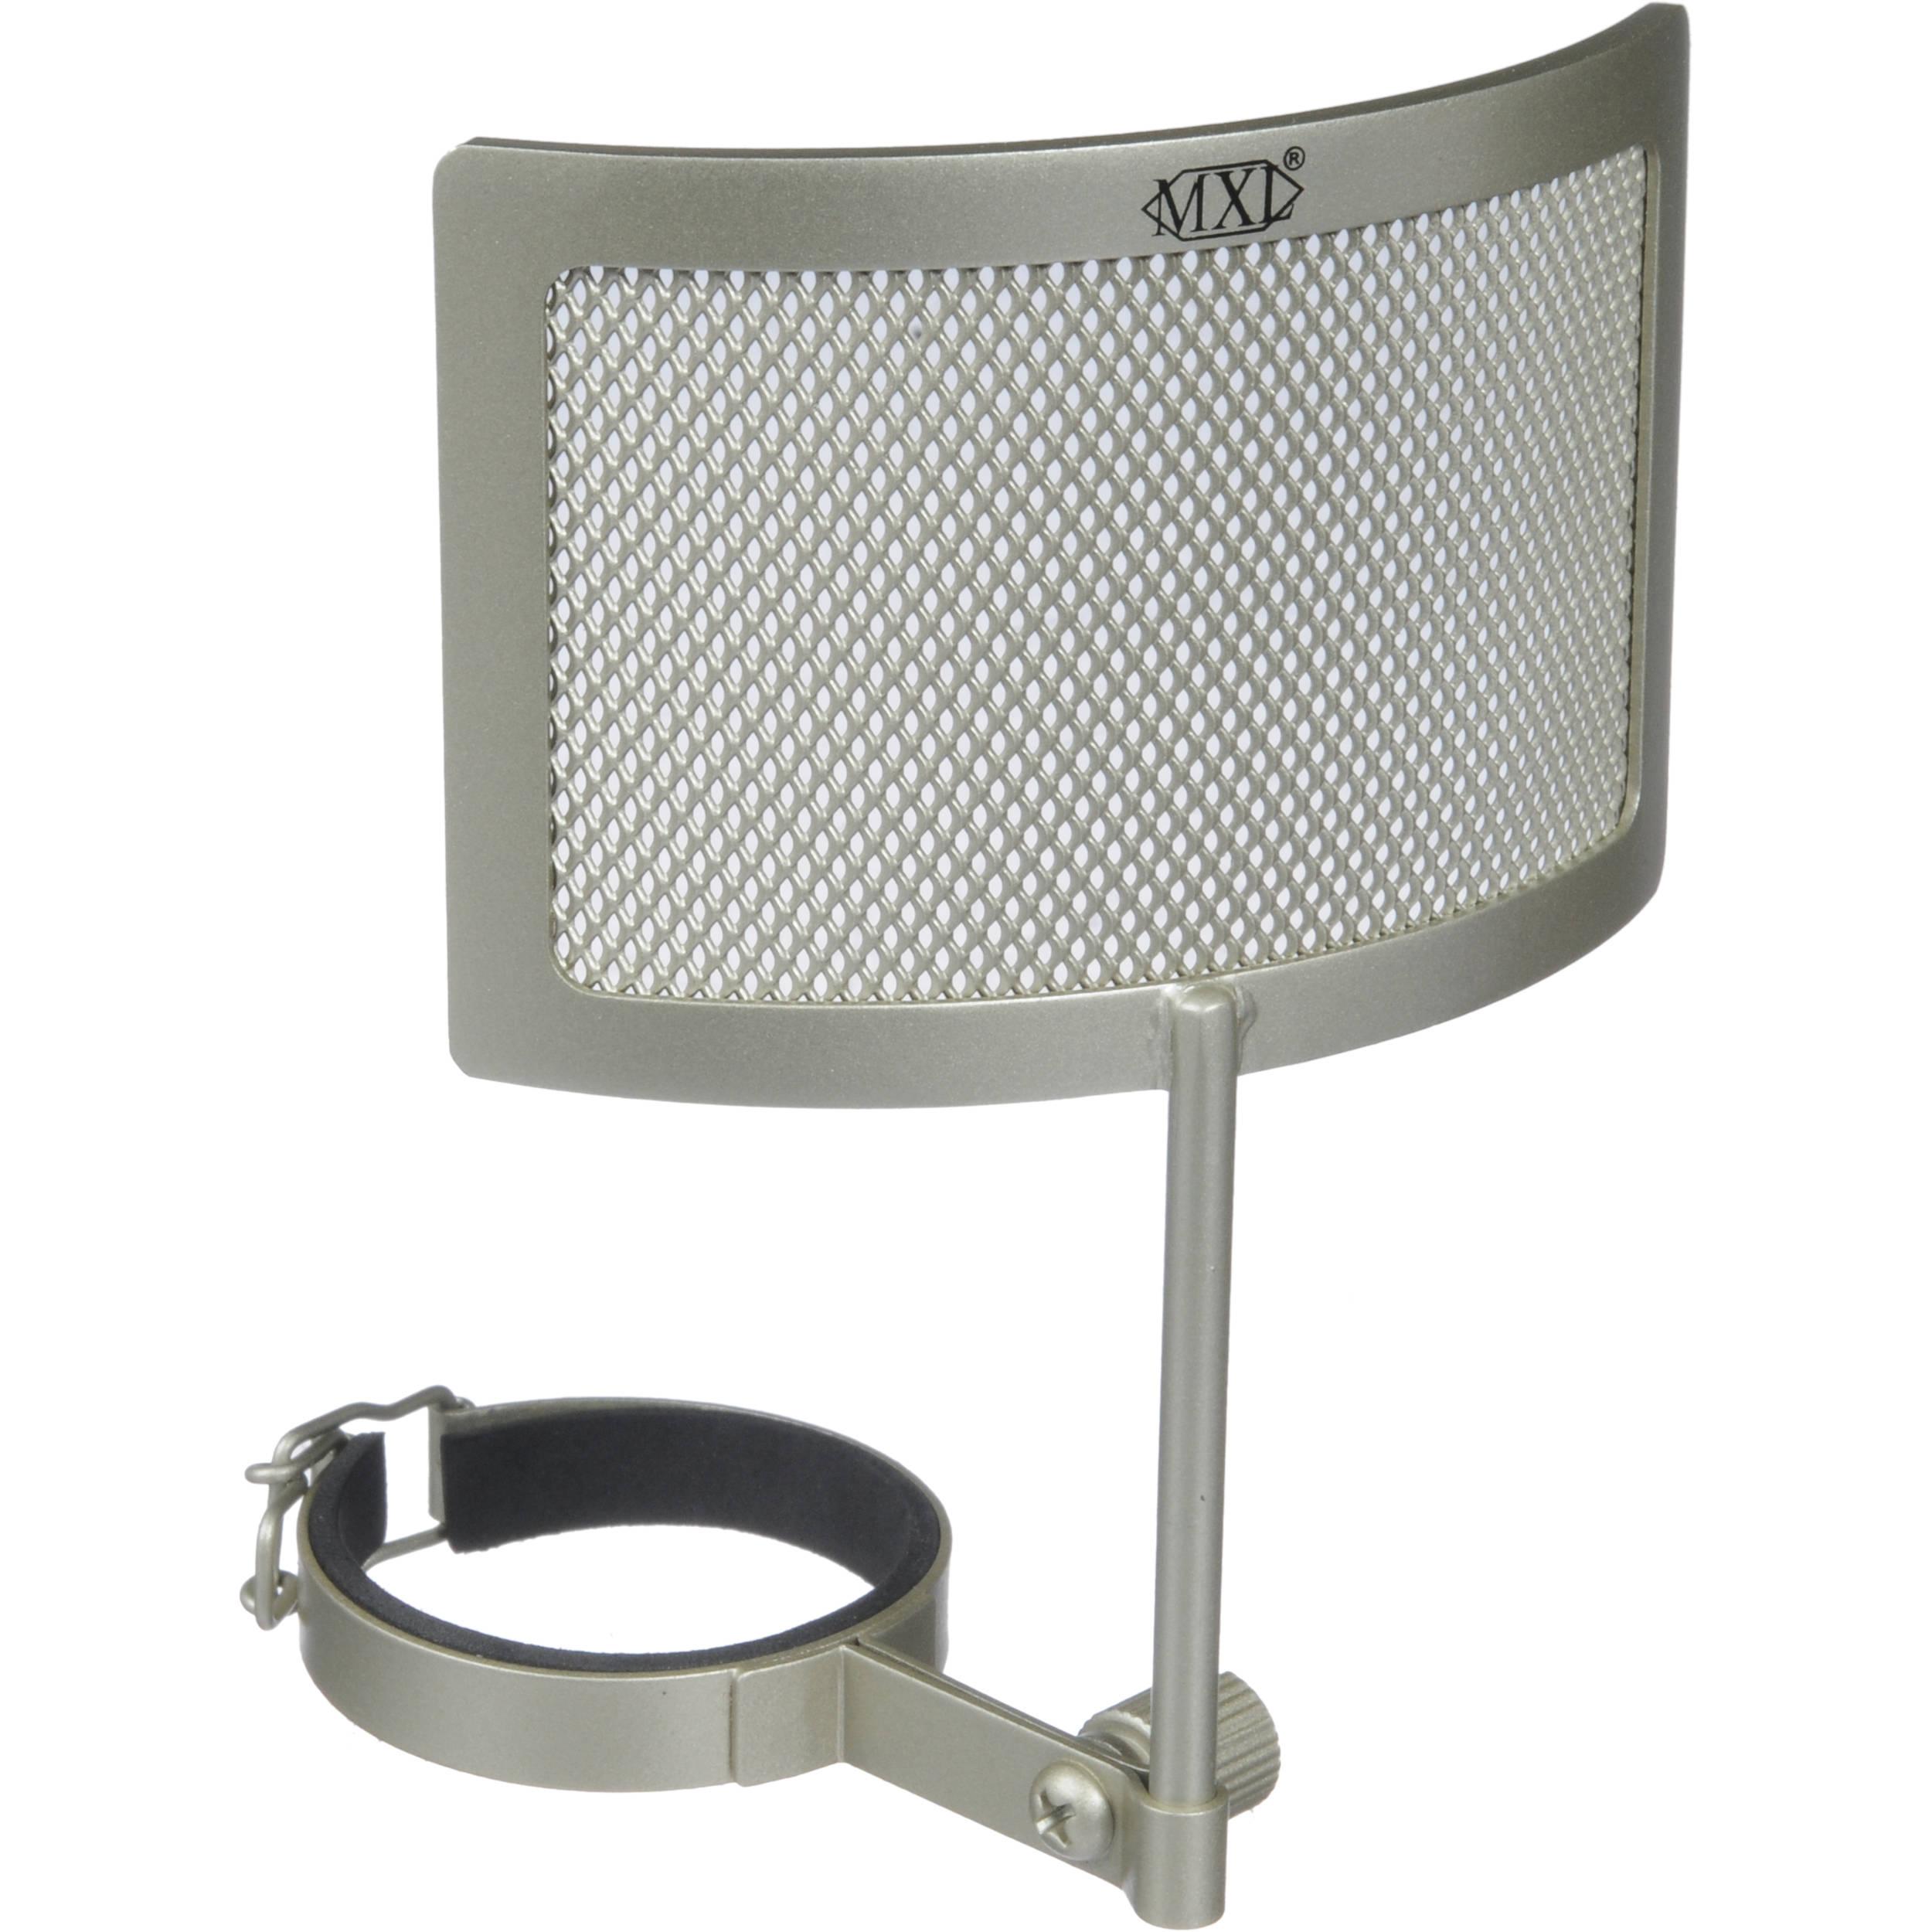 mxl pf 005 c metal mesh pop filter champagne pf 005 c b h. Black Bedroom Furniture Sets. Home Design Ideas